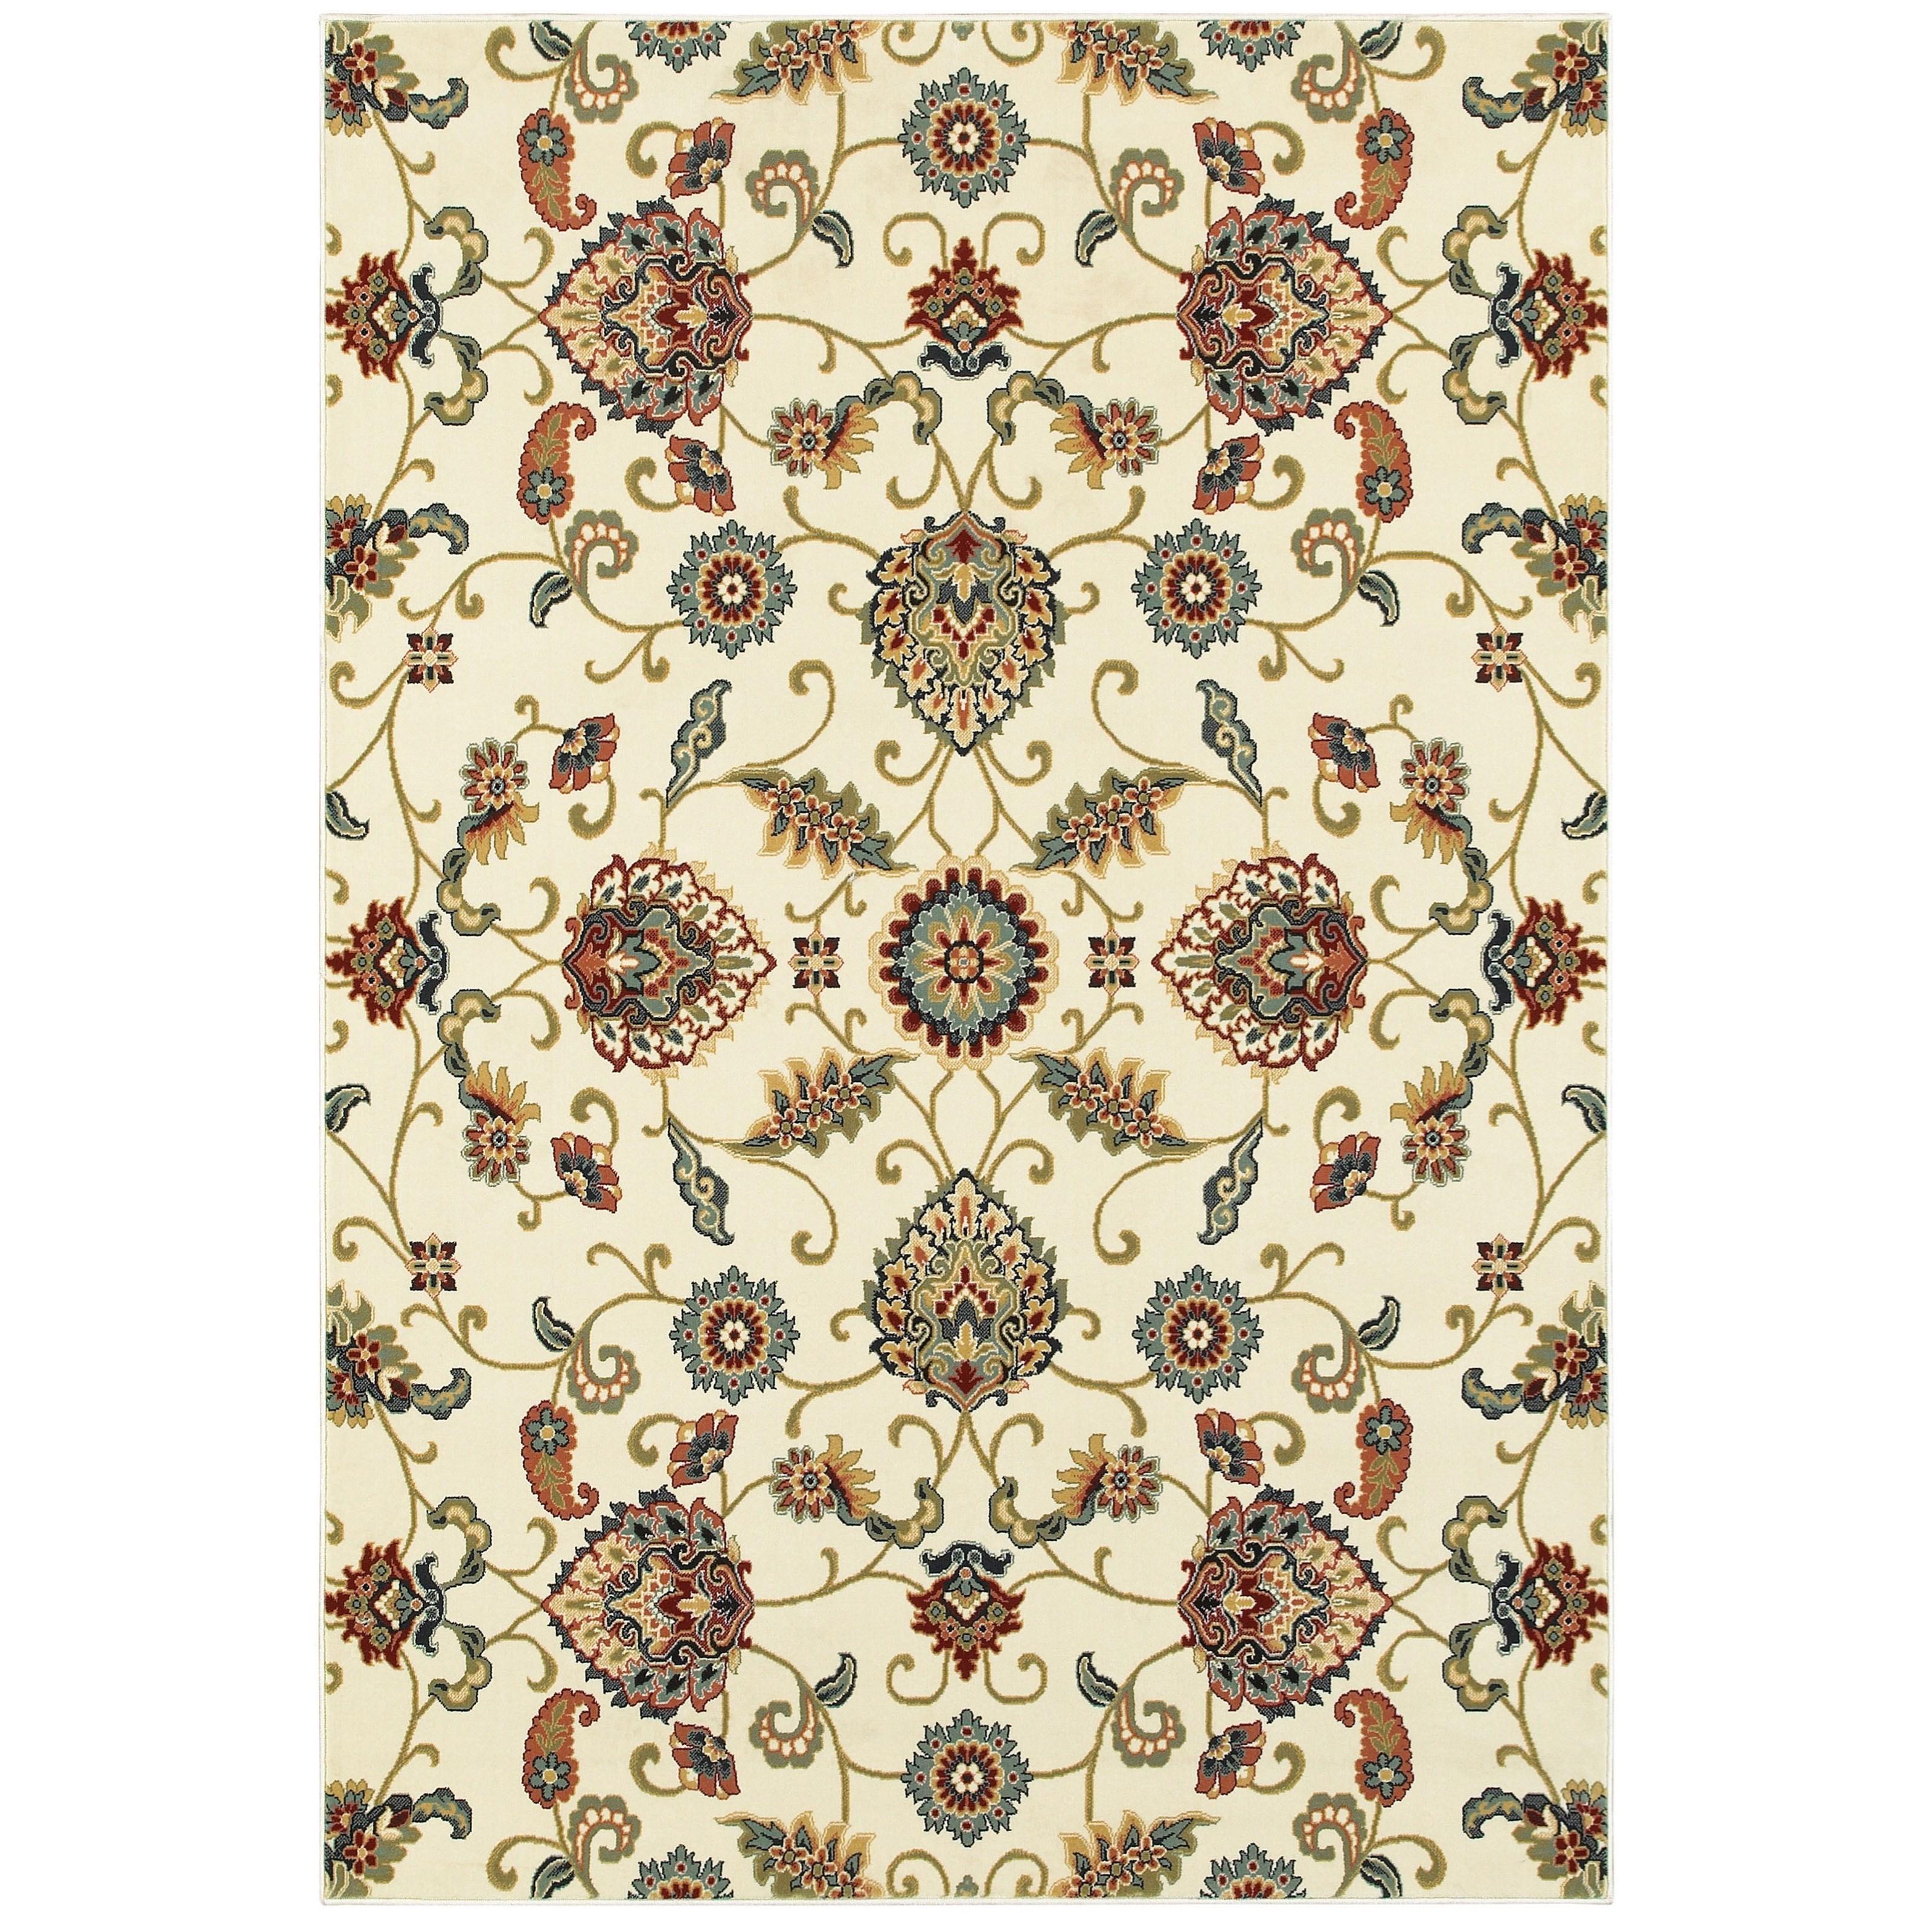 "Kashan 7'10"" X 10'10"" Rectangle Rug by Oriental Weavers at Lucas Furniture & Mattress"